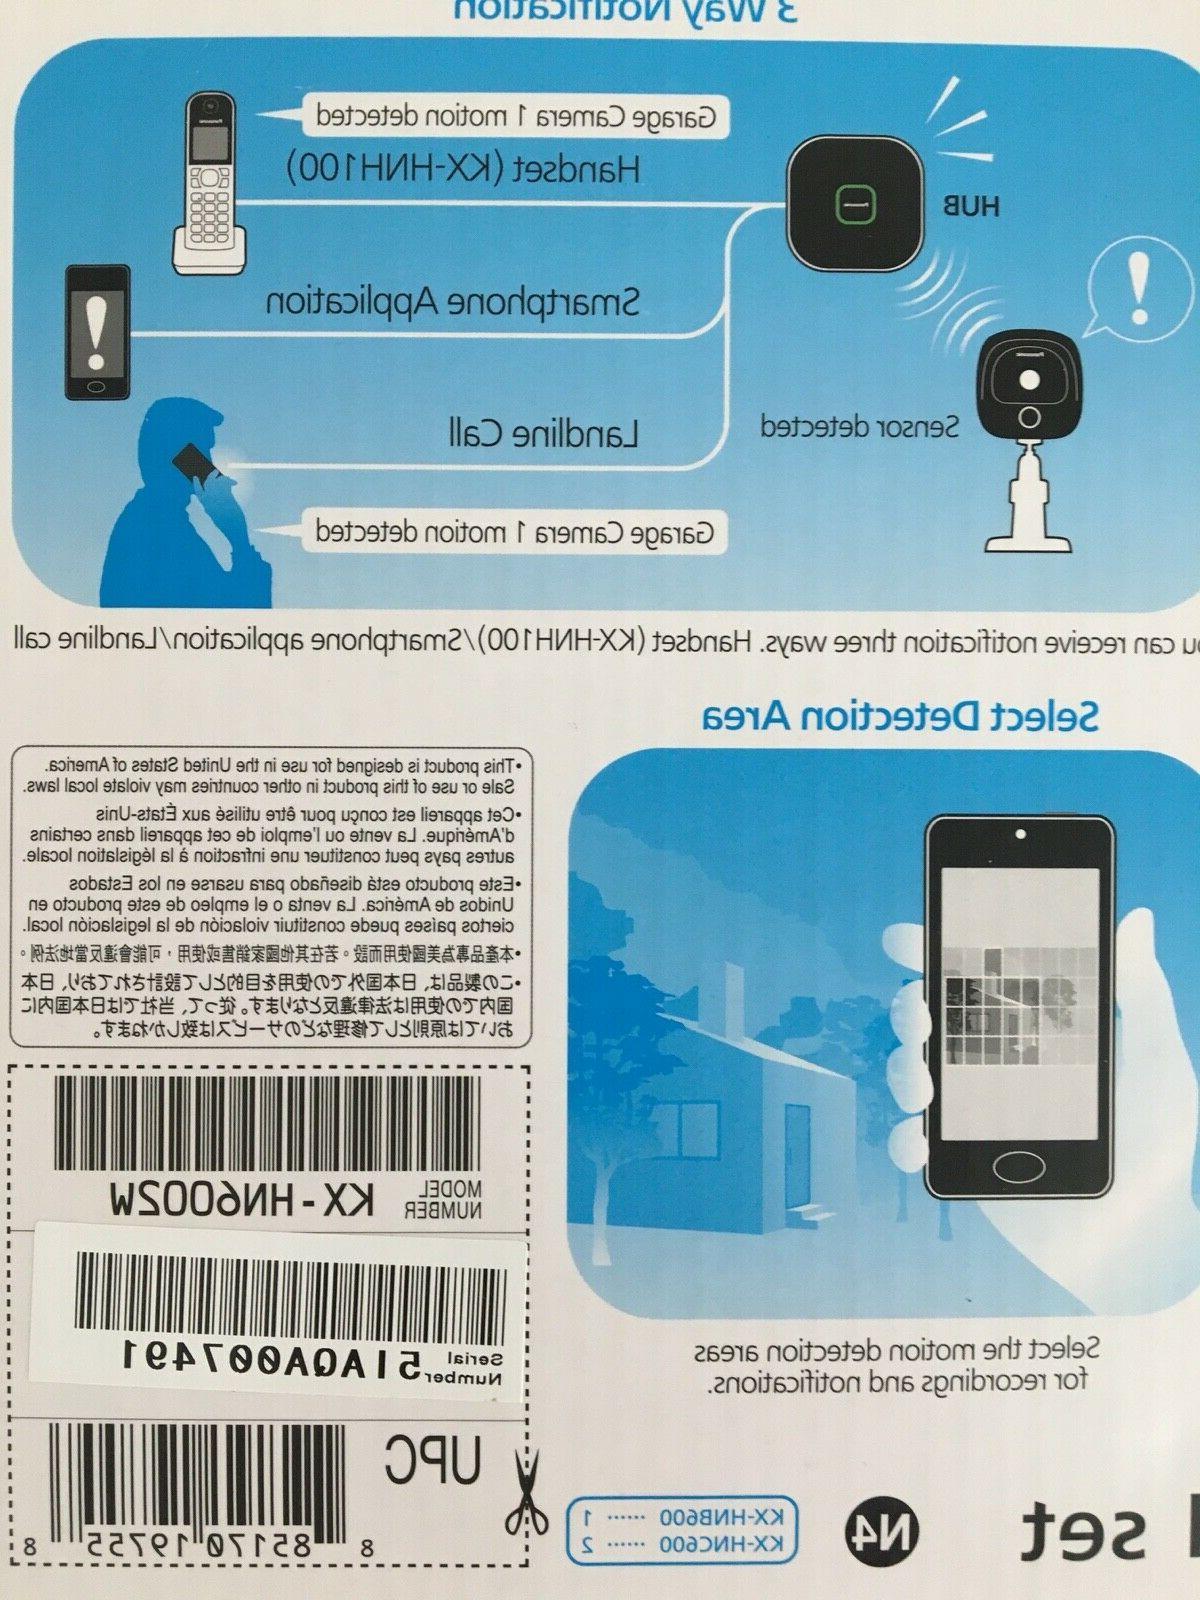 Panasonic Kx-hn6002 Home Surveillance System Security